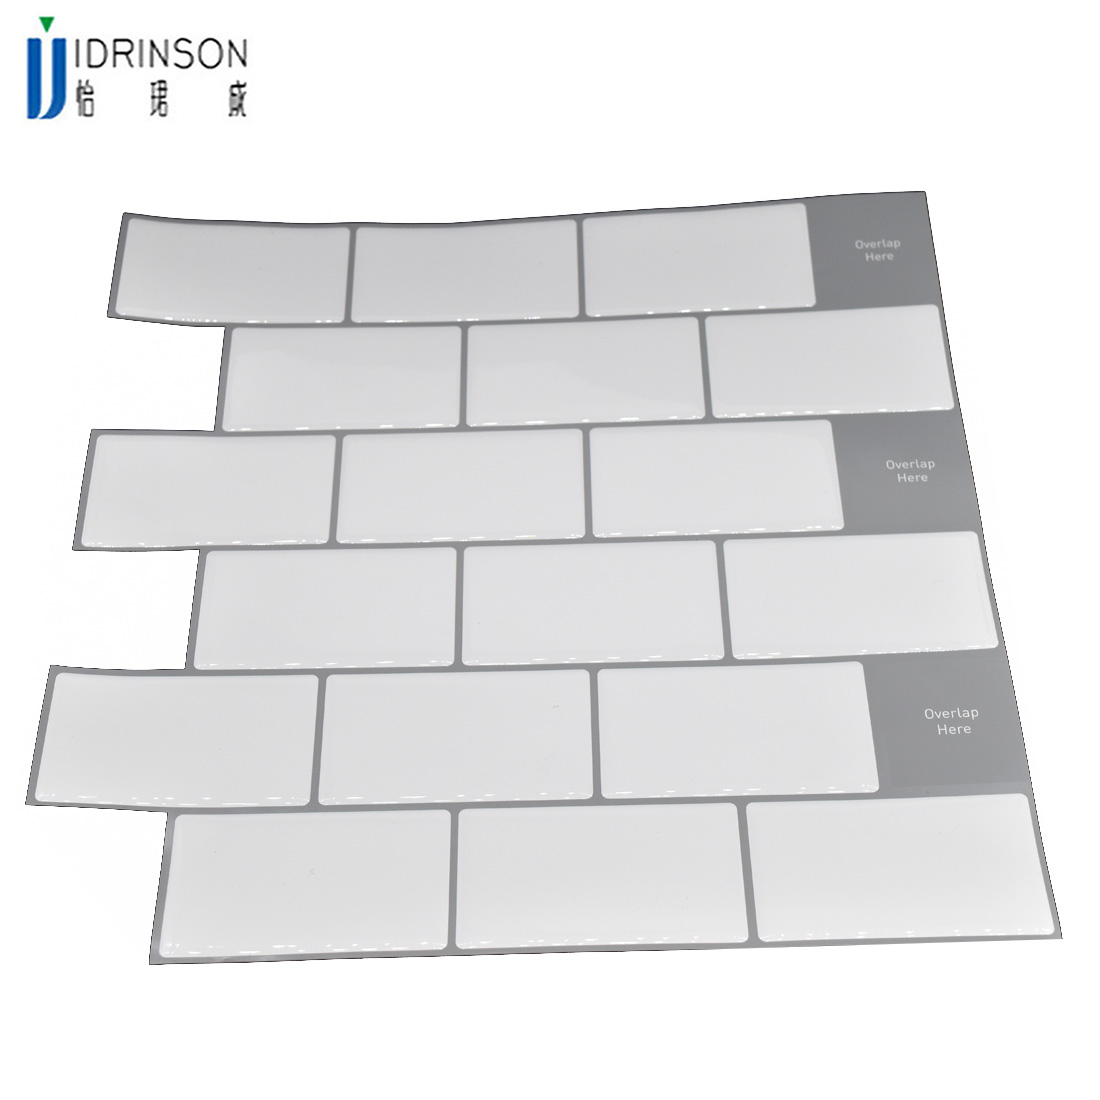 White large anti-tiles self-adhesive 3D wallpaper DIY kitchen bathroom decorative wall tiles white subway(China)